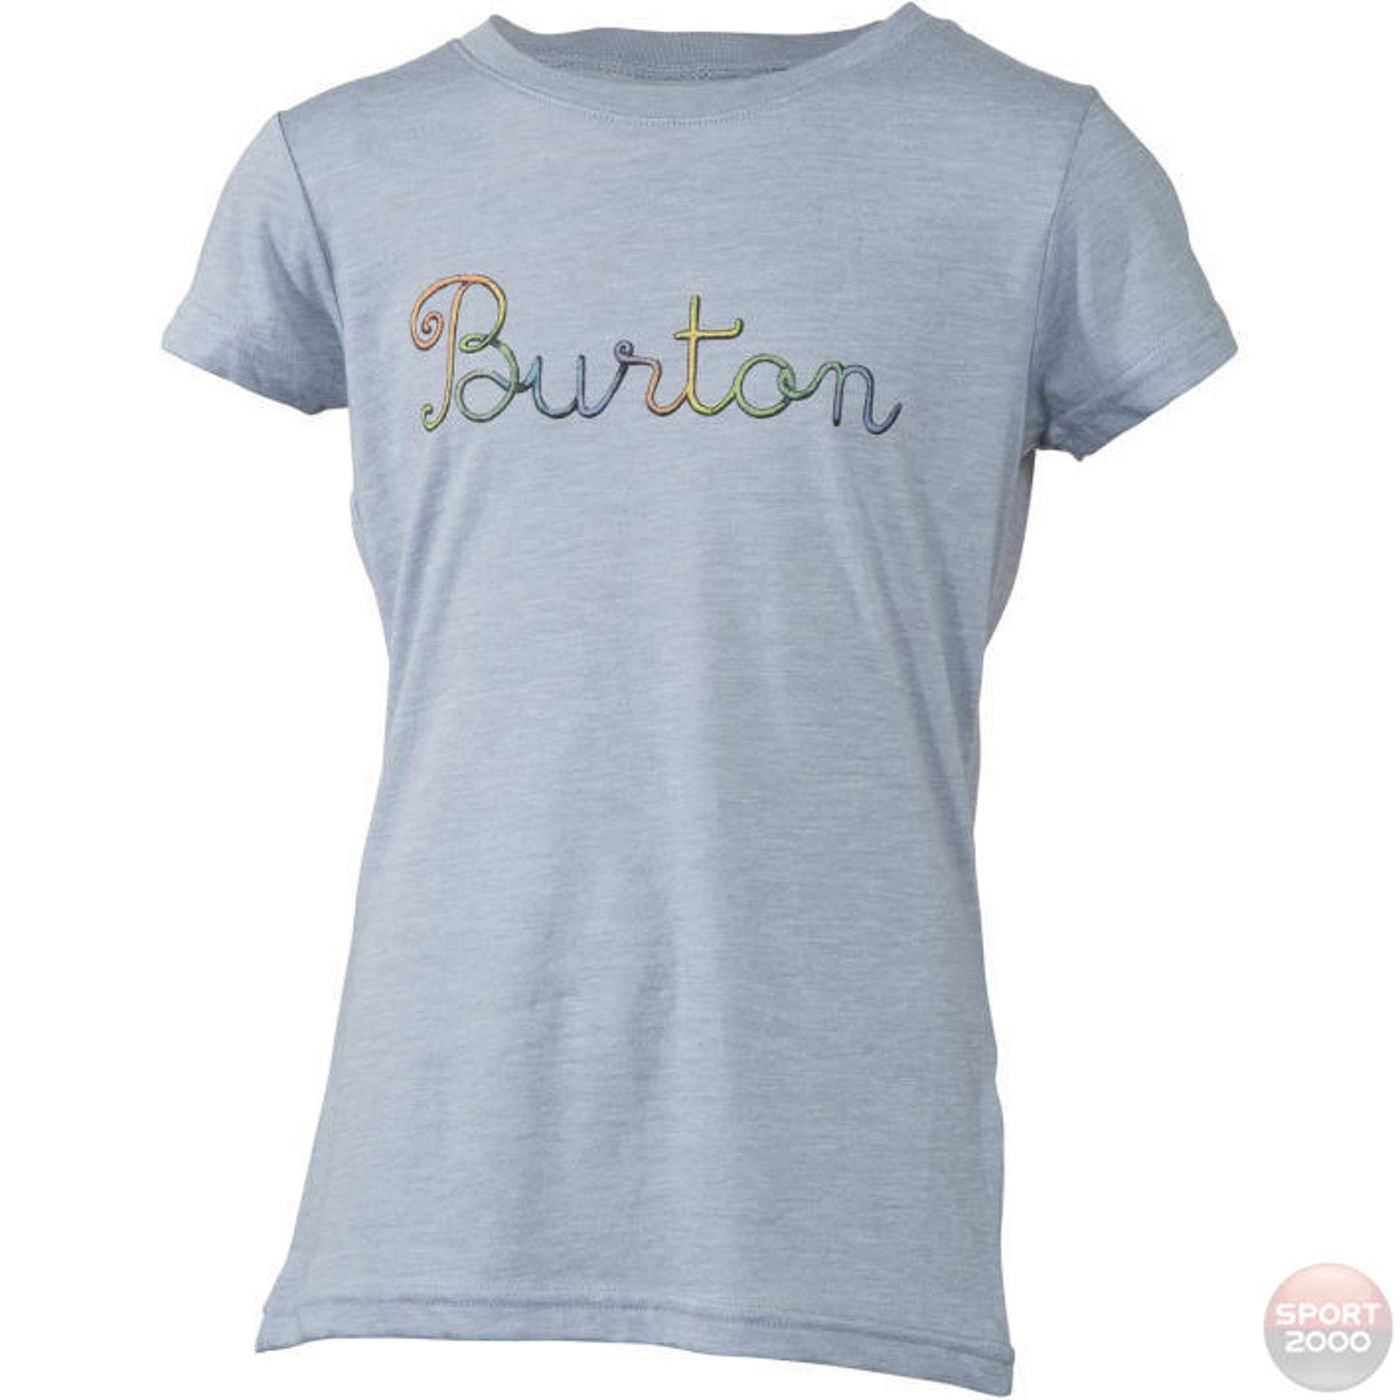 BURTON Shirt HUE Md. - Kinder